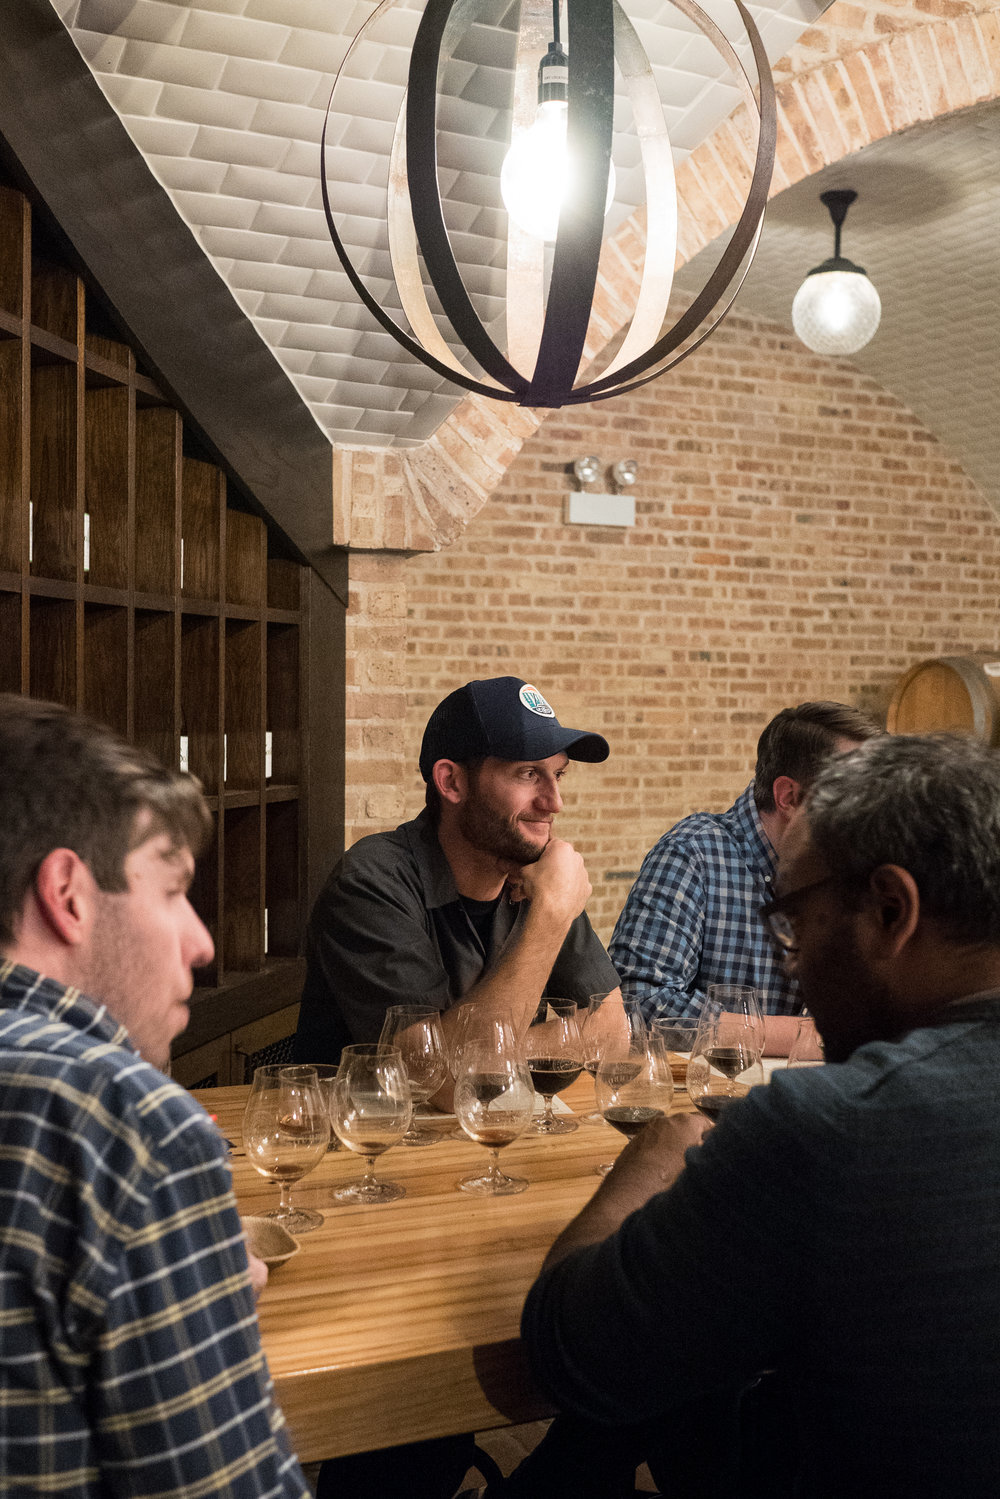 Goose Island brewer,Quinn Fuechsl, contemplates his chosen recipe for 2017's Proprietor's BCBS.